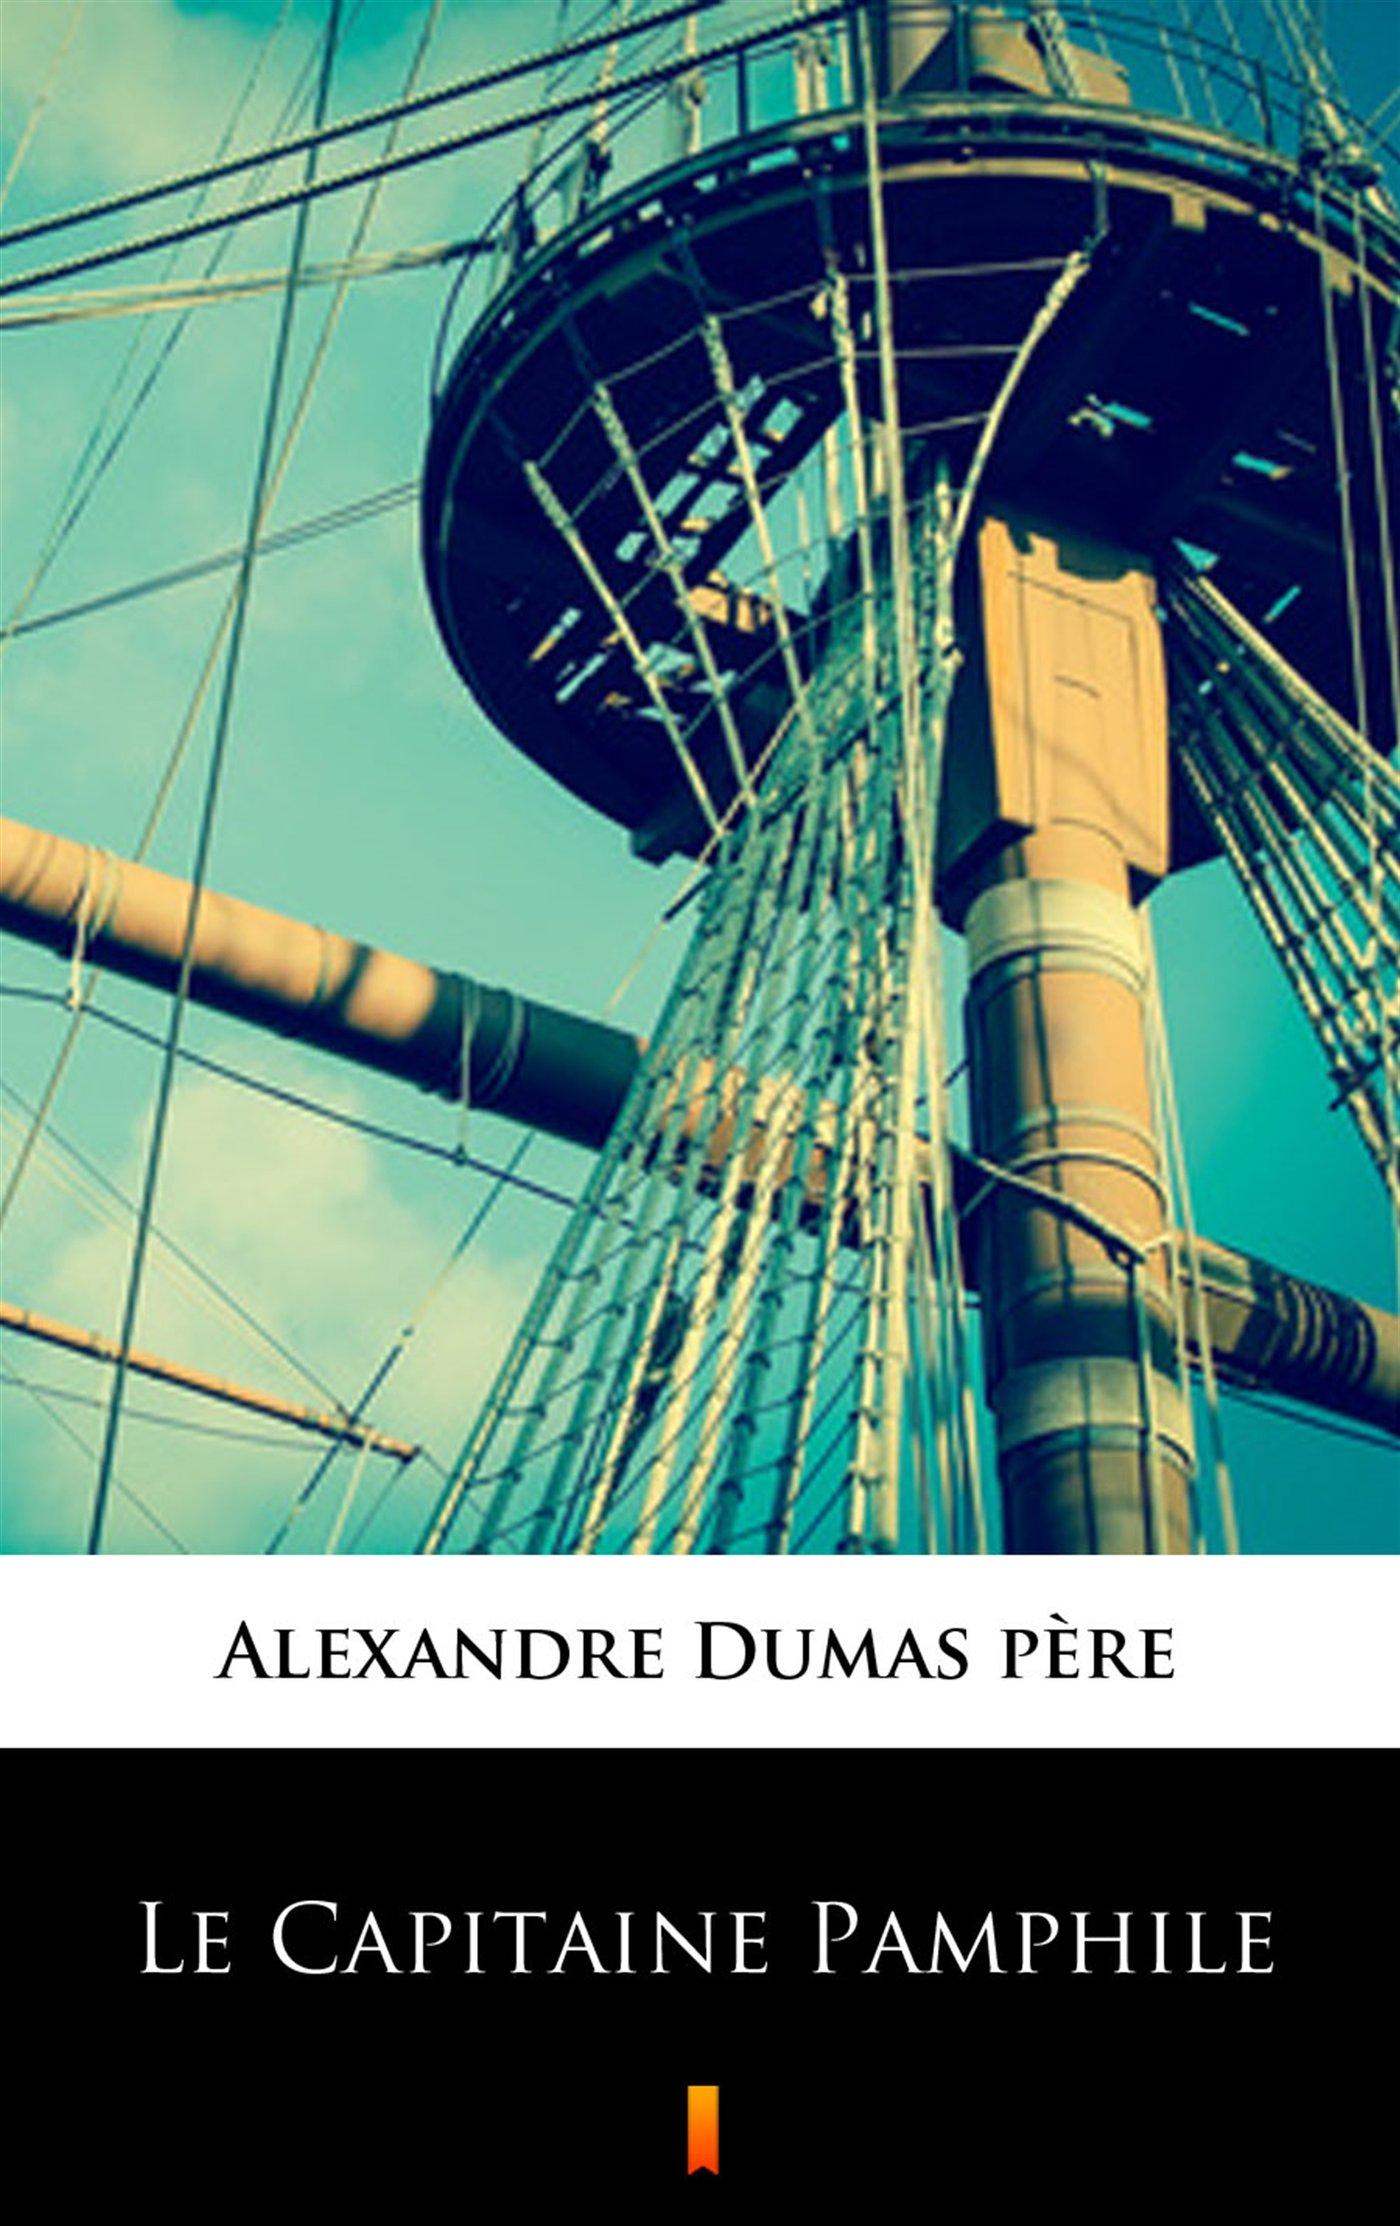 Le Capitaine Pamphile - Ebook (Książka na Kindle) do pobrania w formacie MOBI